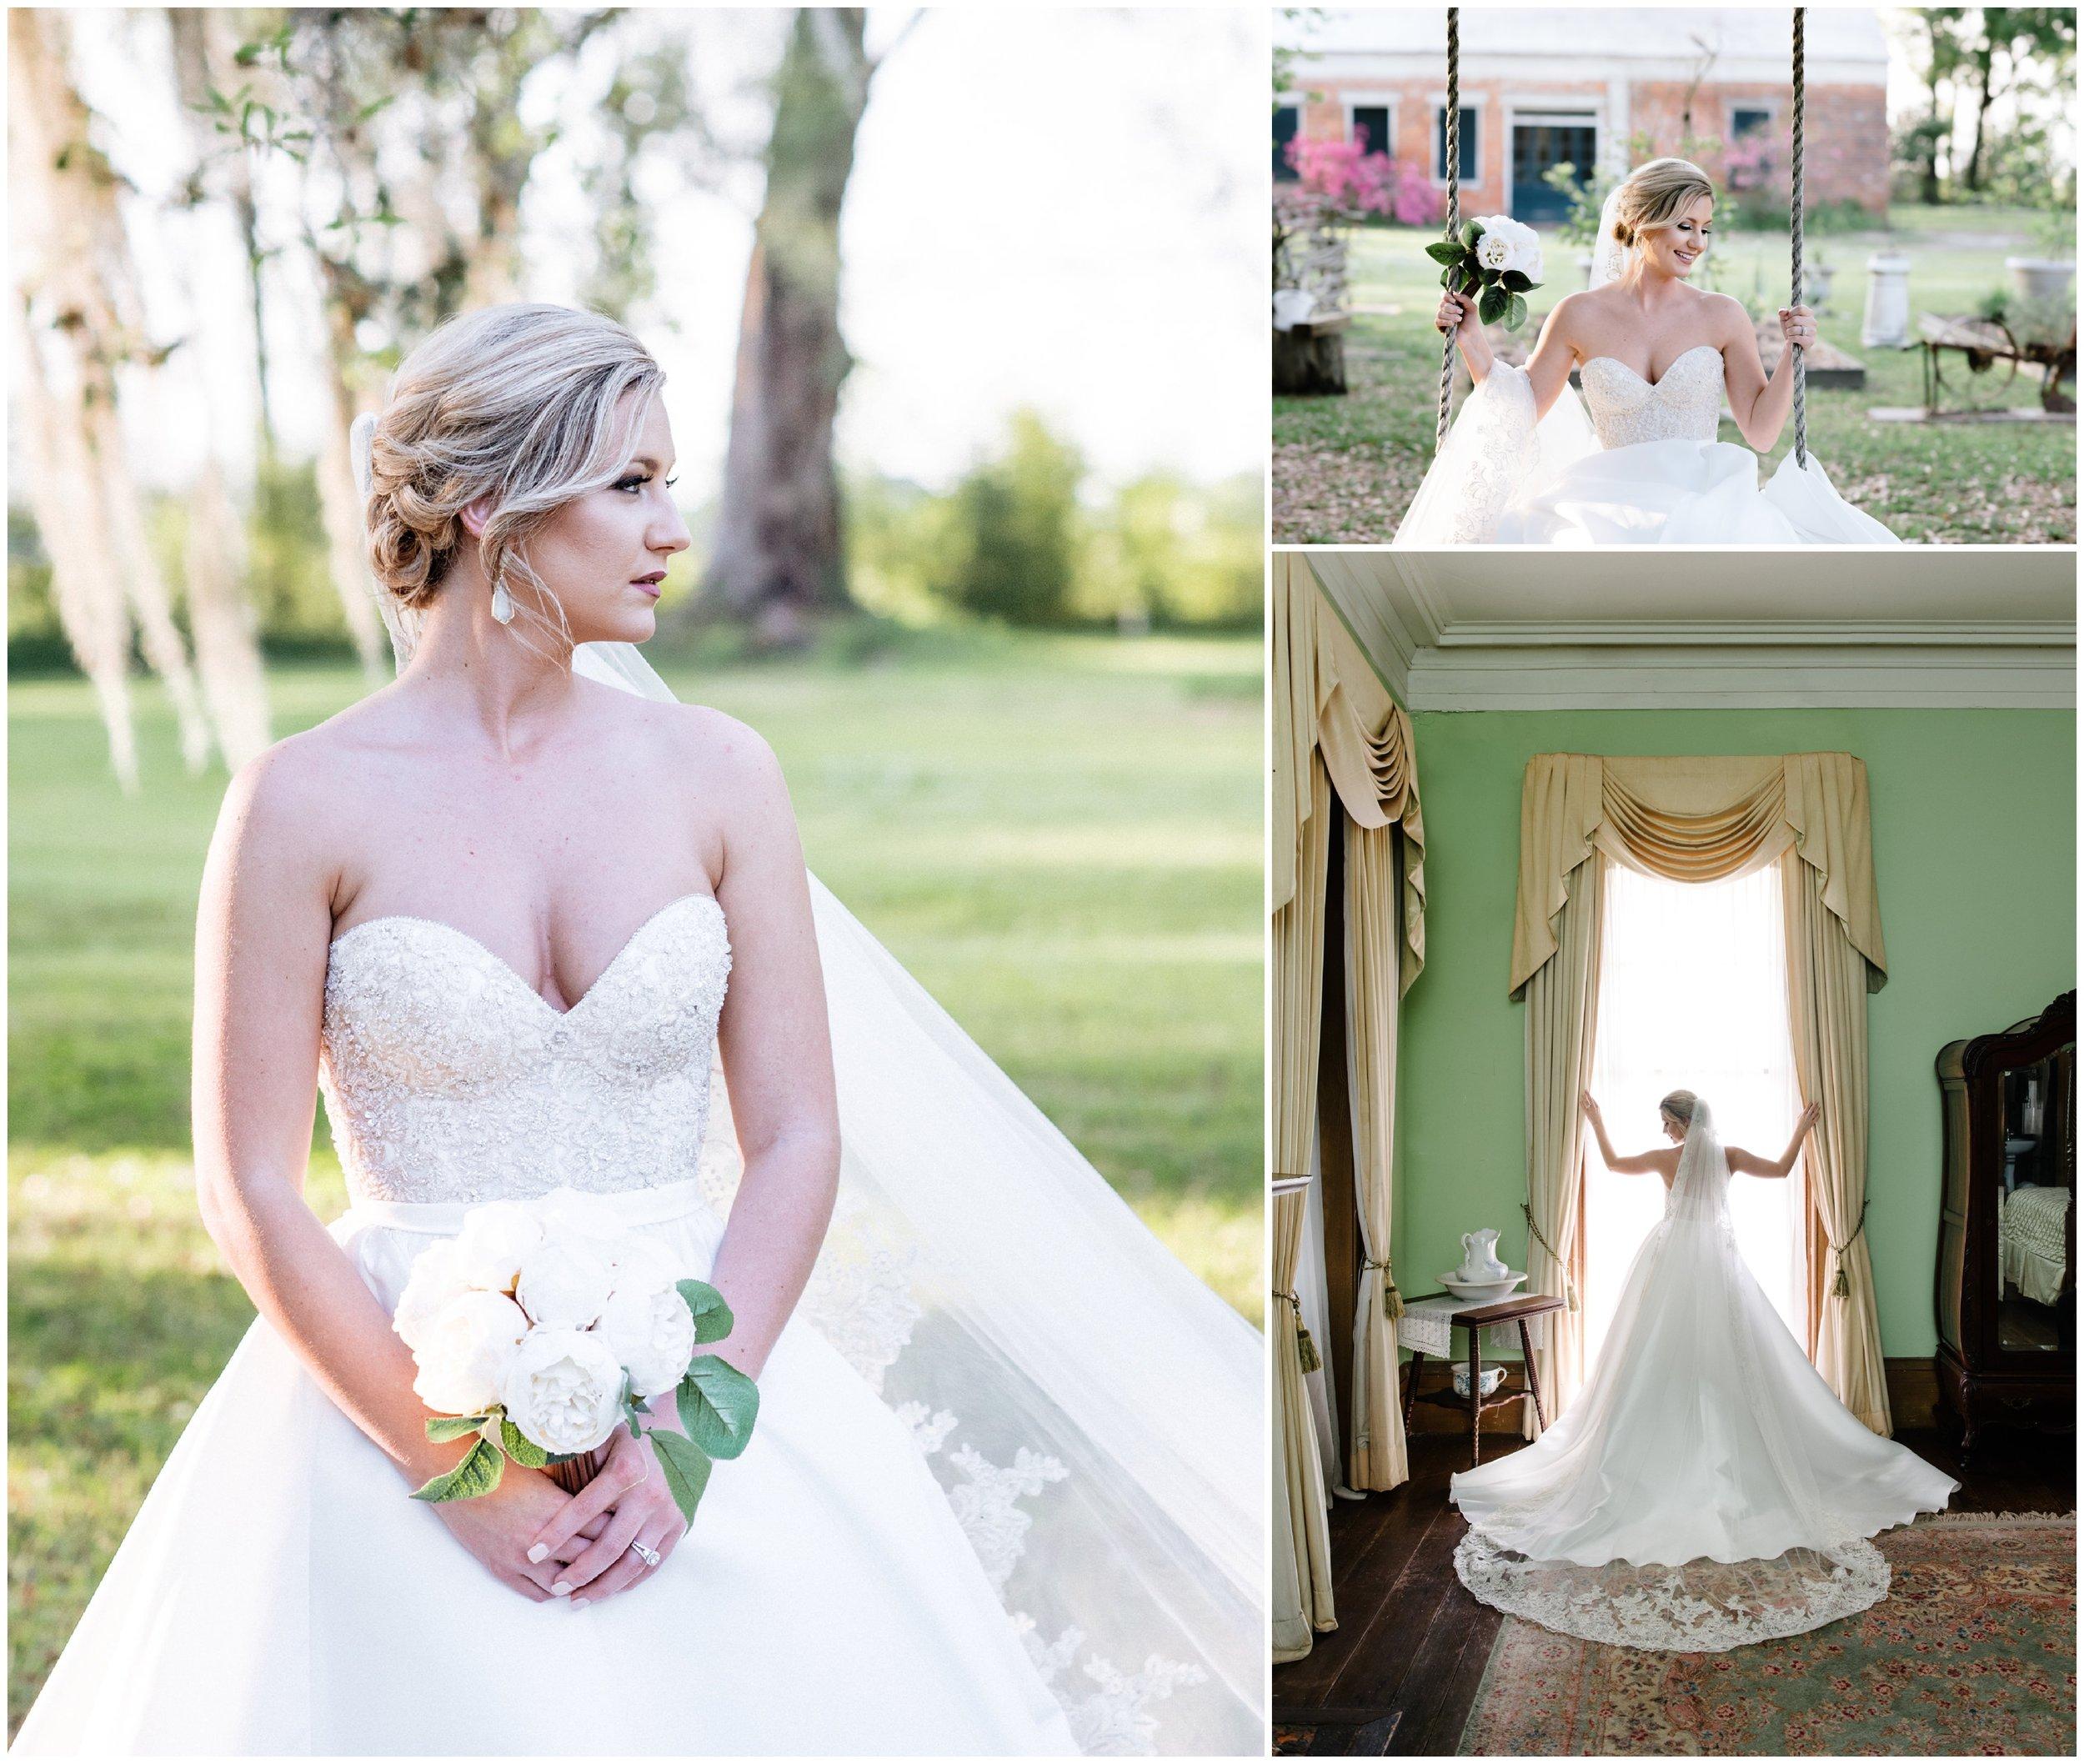 Bridals at Madewood Plantation in Napoleonville, Louisiana